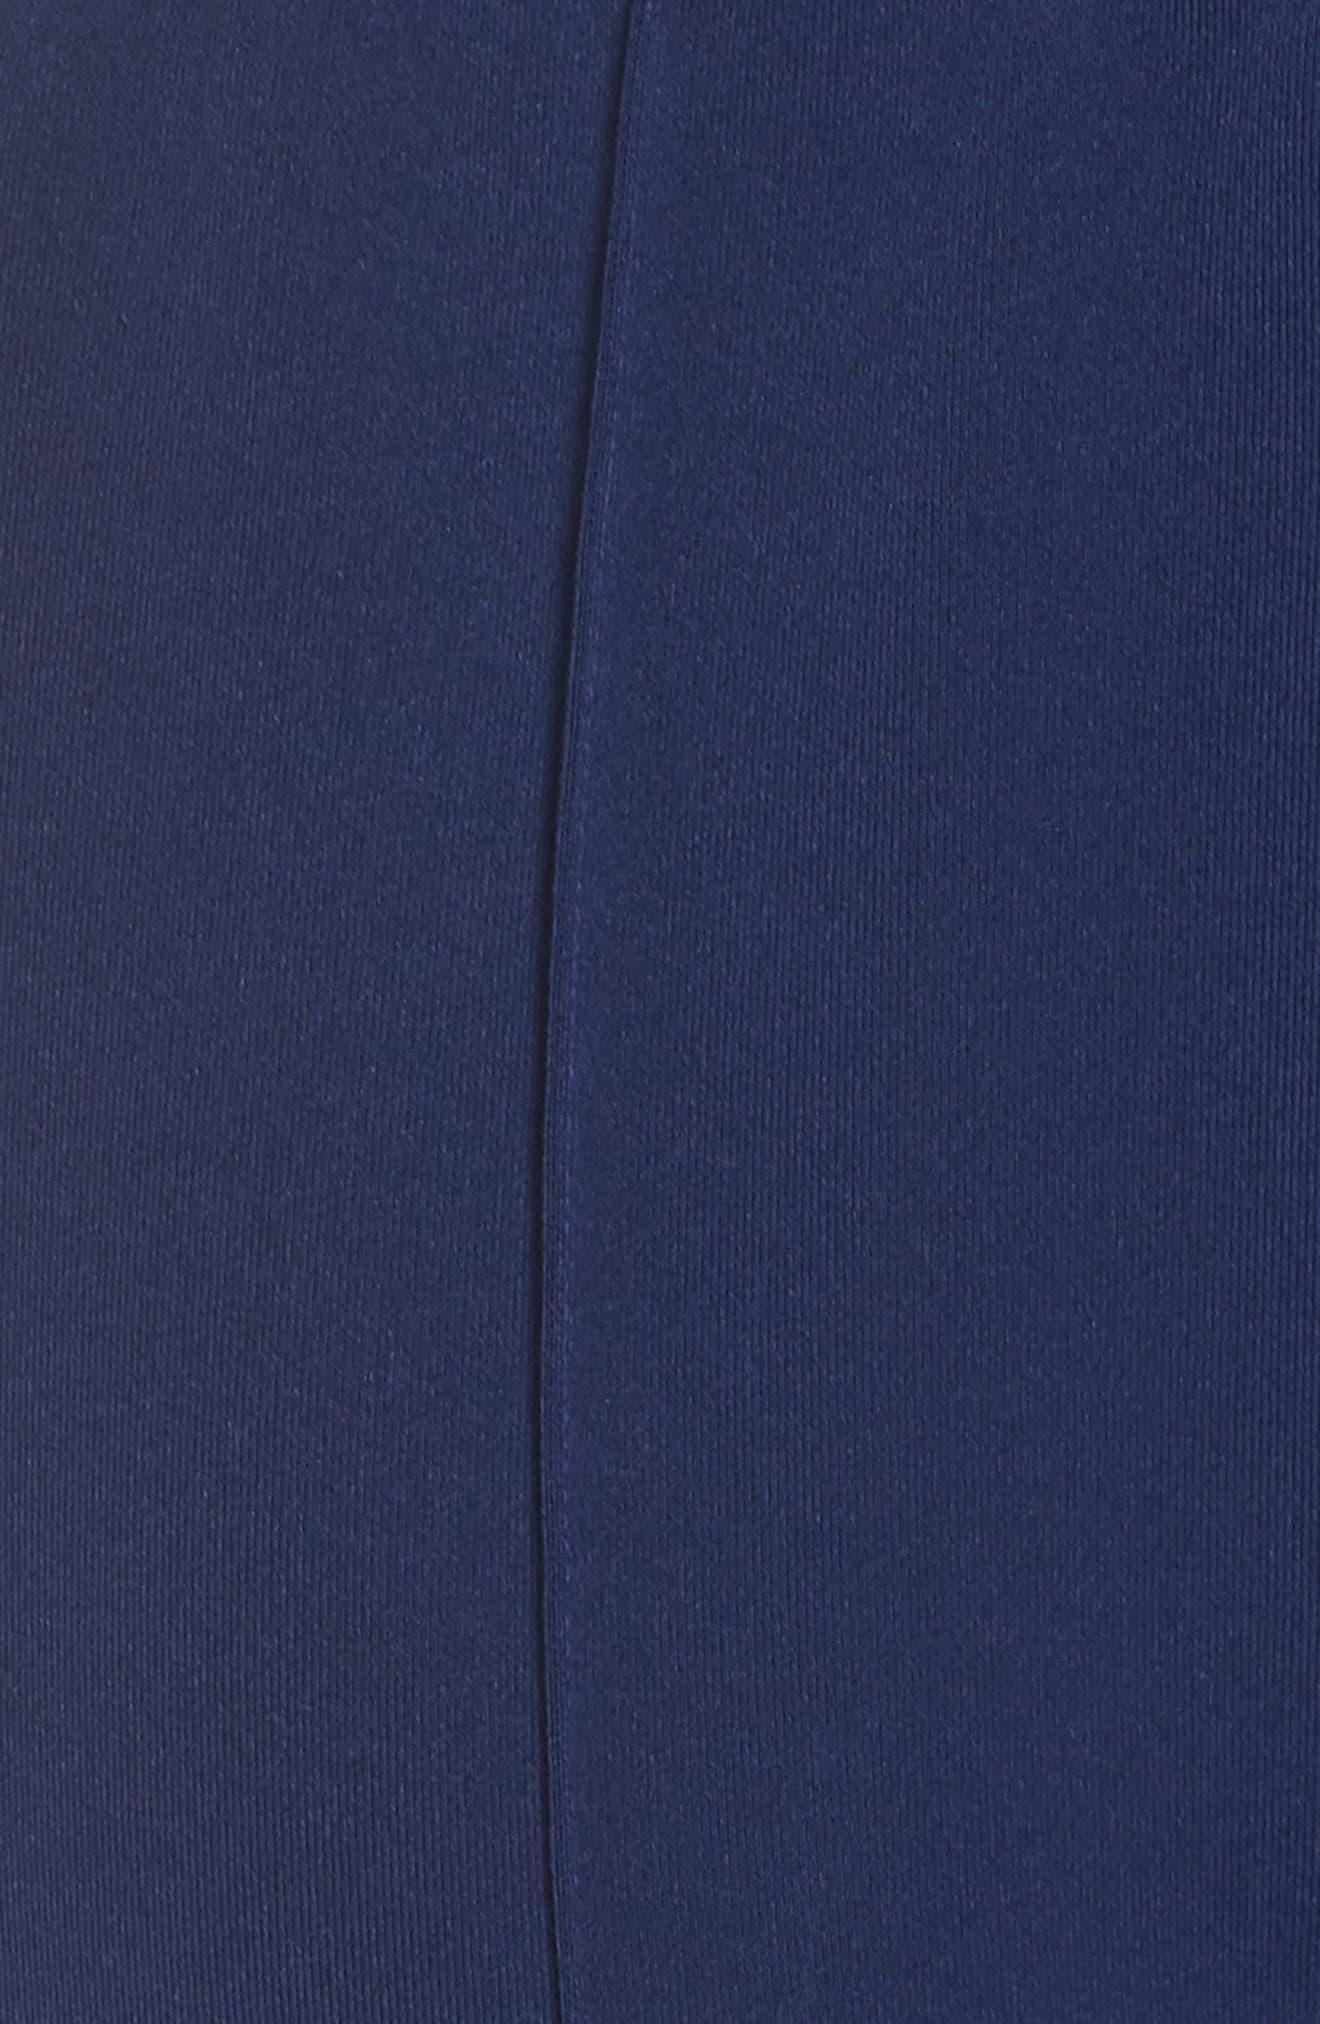 ,                             adidas SST Track Pants,                             Alternate thumbnail 62, color,                             415